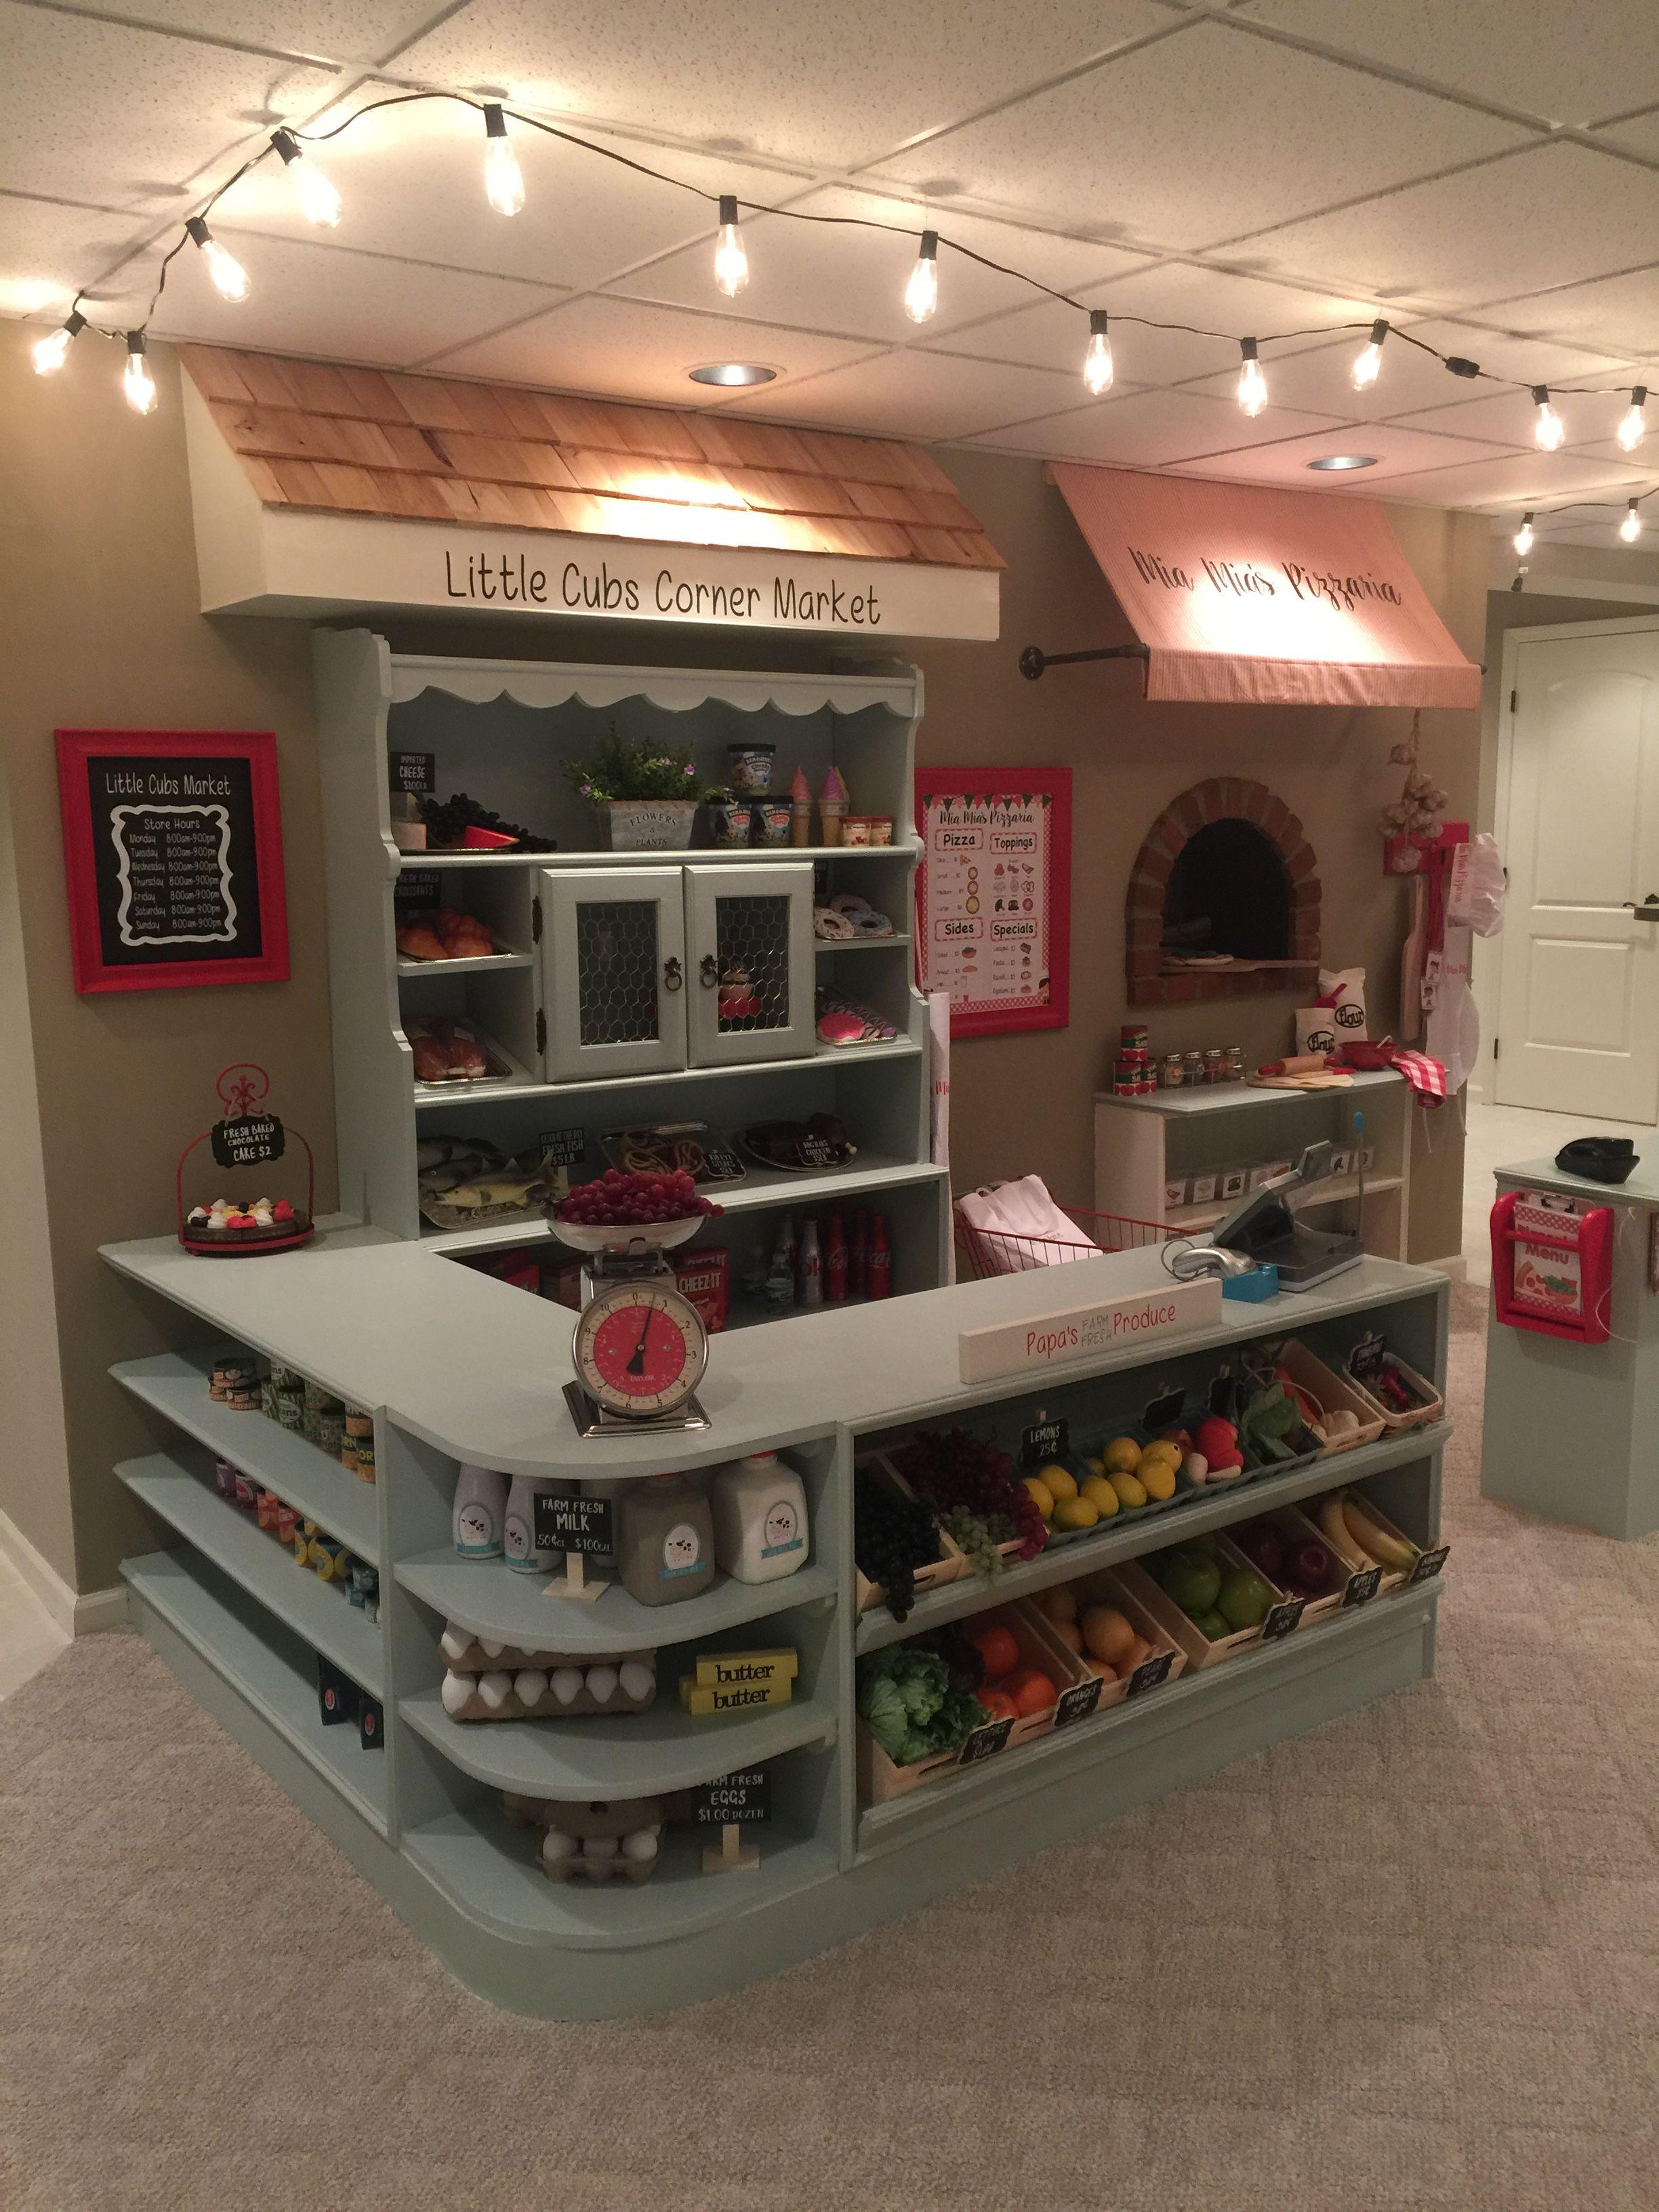 diy play play market camper remodel salle de jeux enfants salle de jeux am nagement de. Black Bedroom Furniture Sets. Home Design Ideas